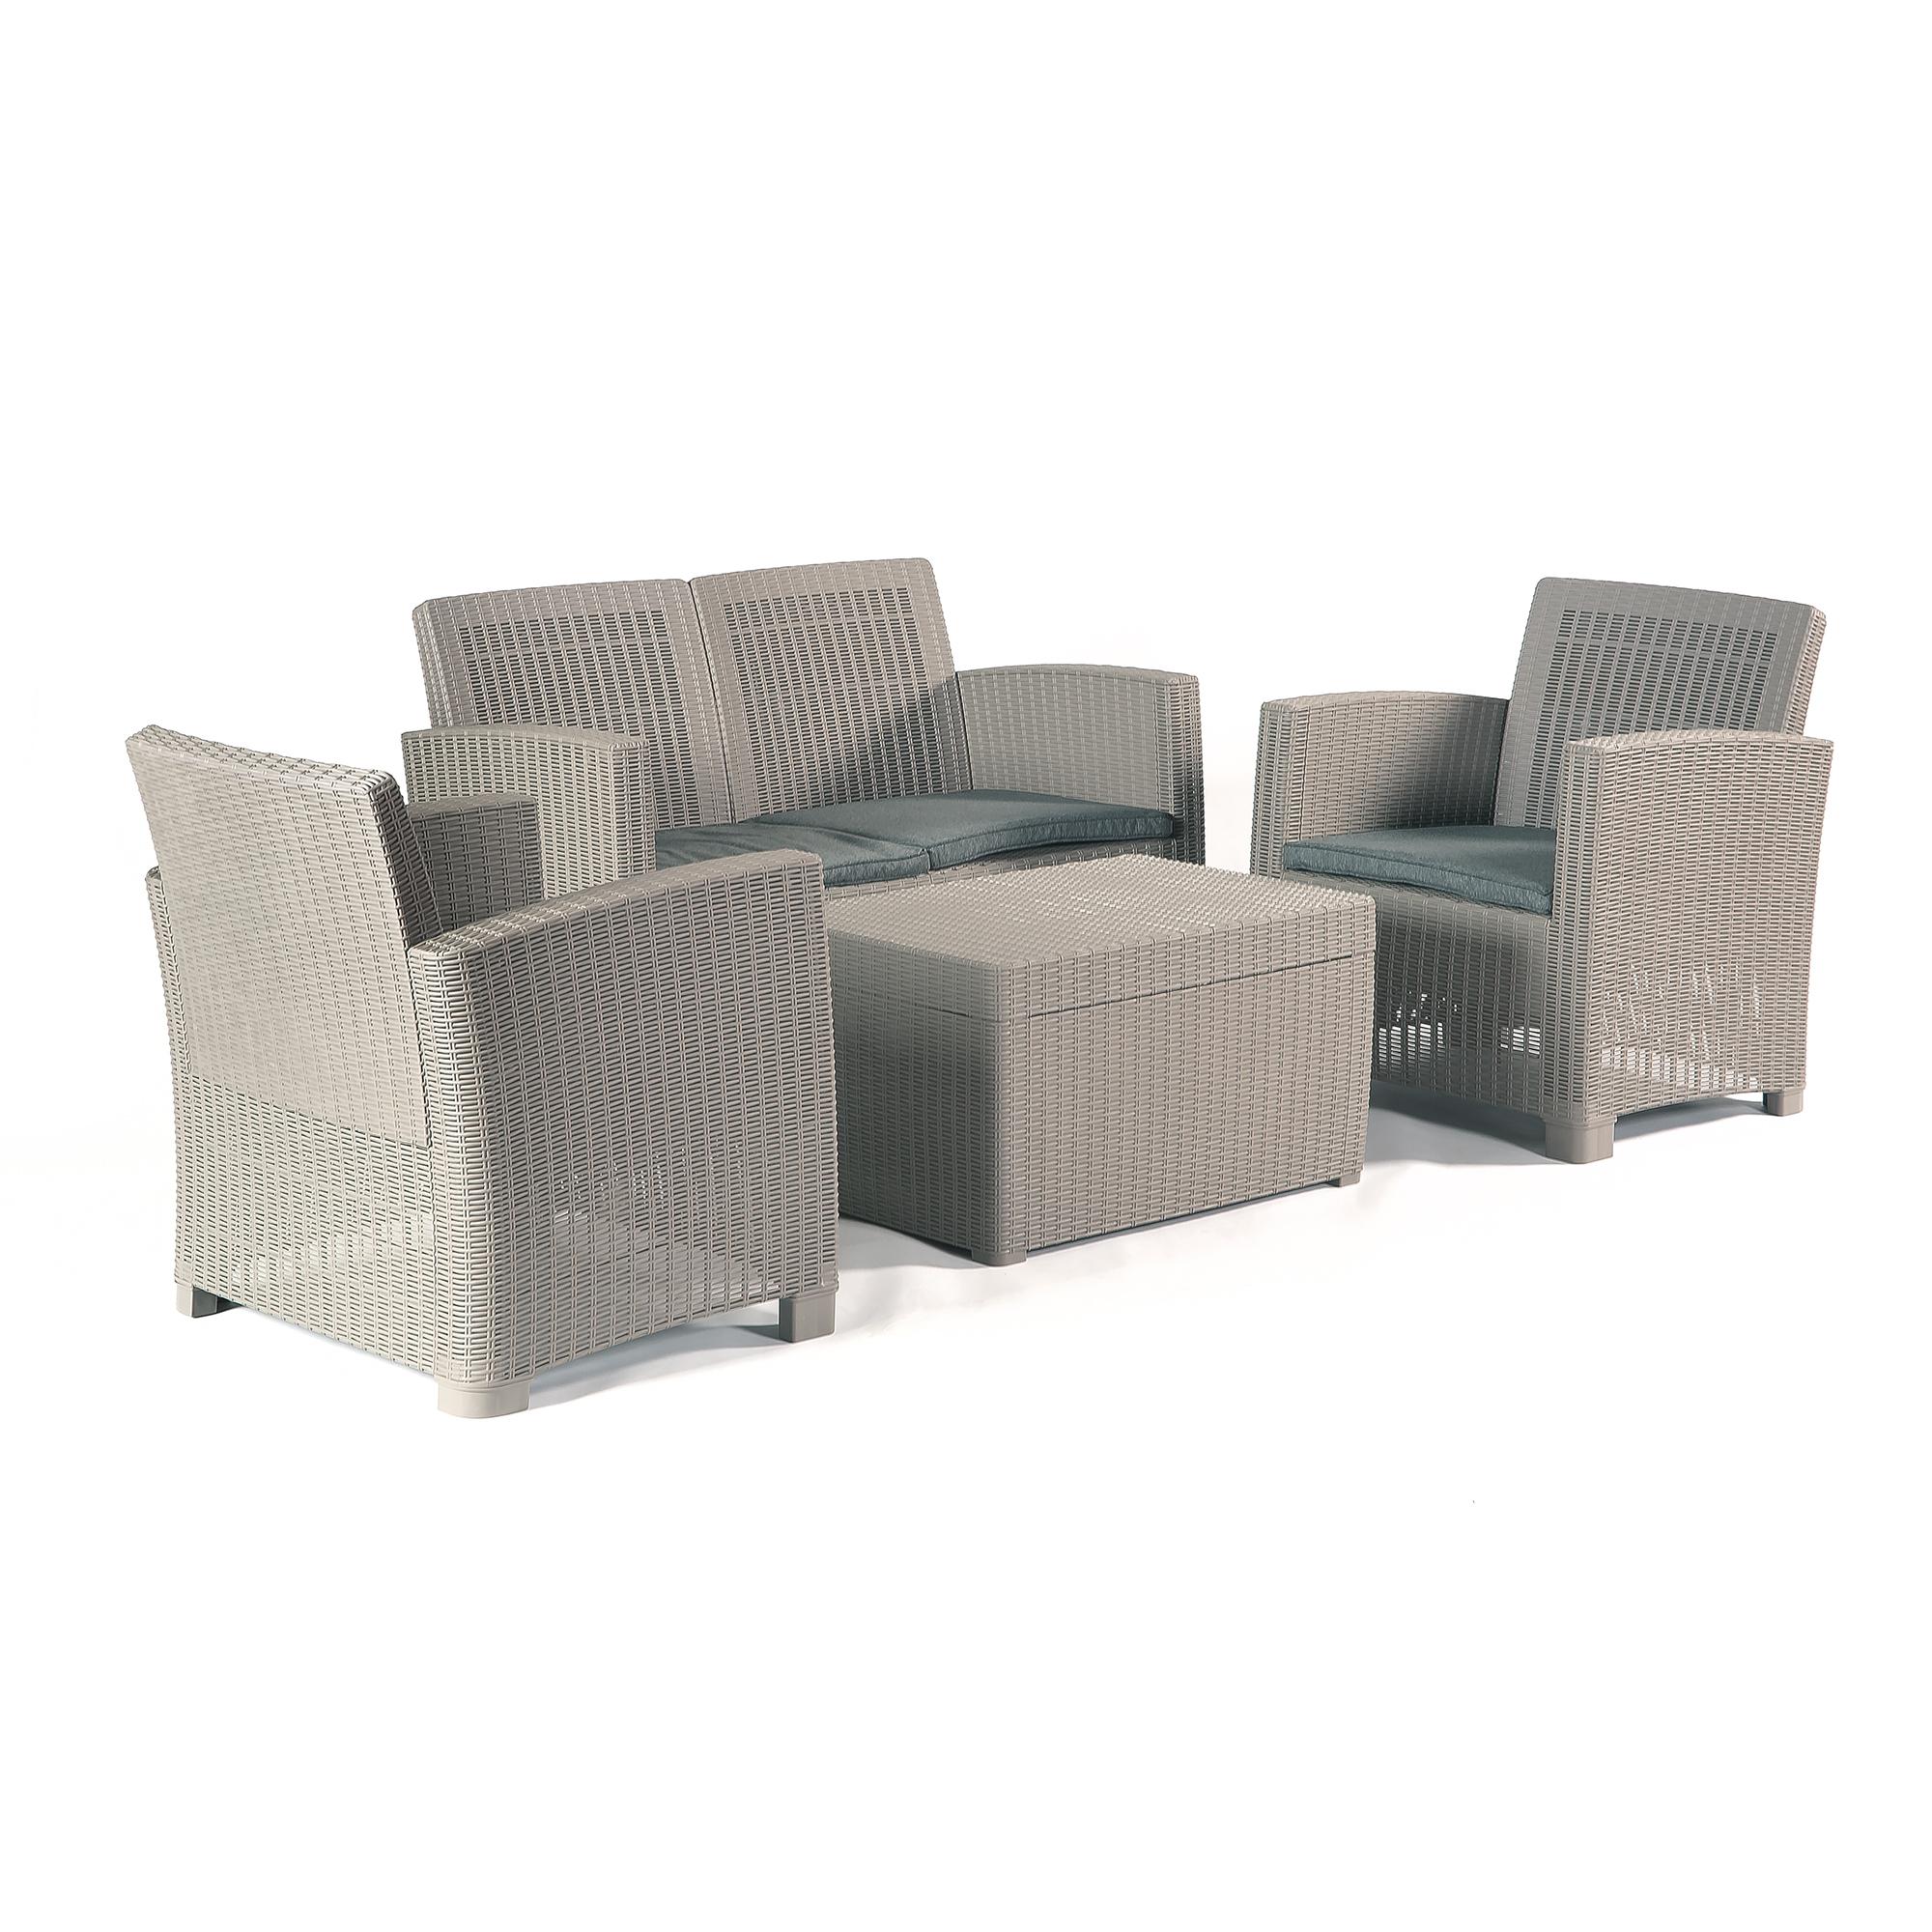 Vienna Plastic Rattan Garden Lounge Set with Storage Table & Seat Cushions